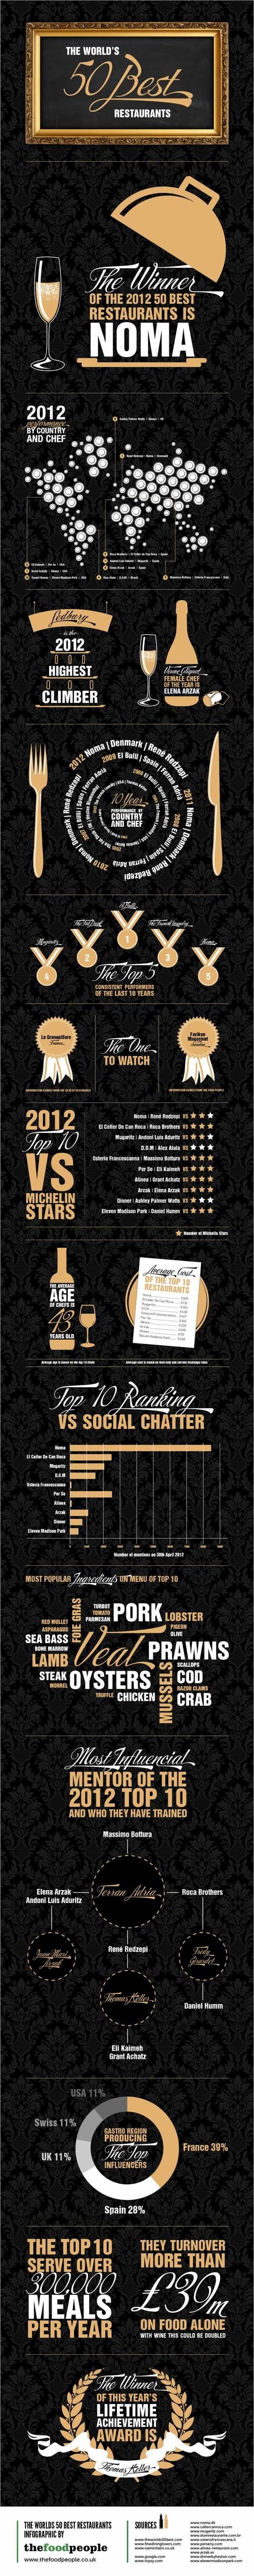 infografia-mejores-restaurantes-del-mundo-2012-san-pellegrino